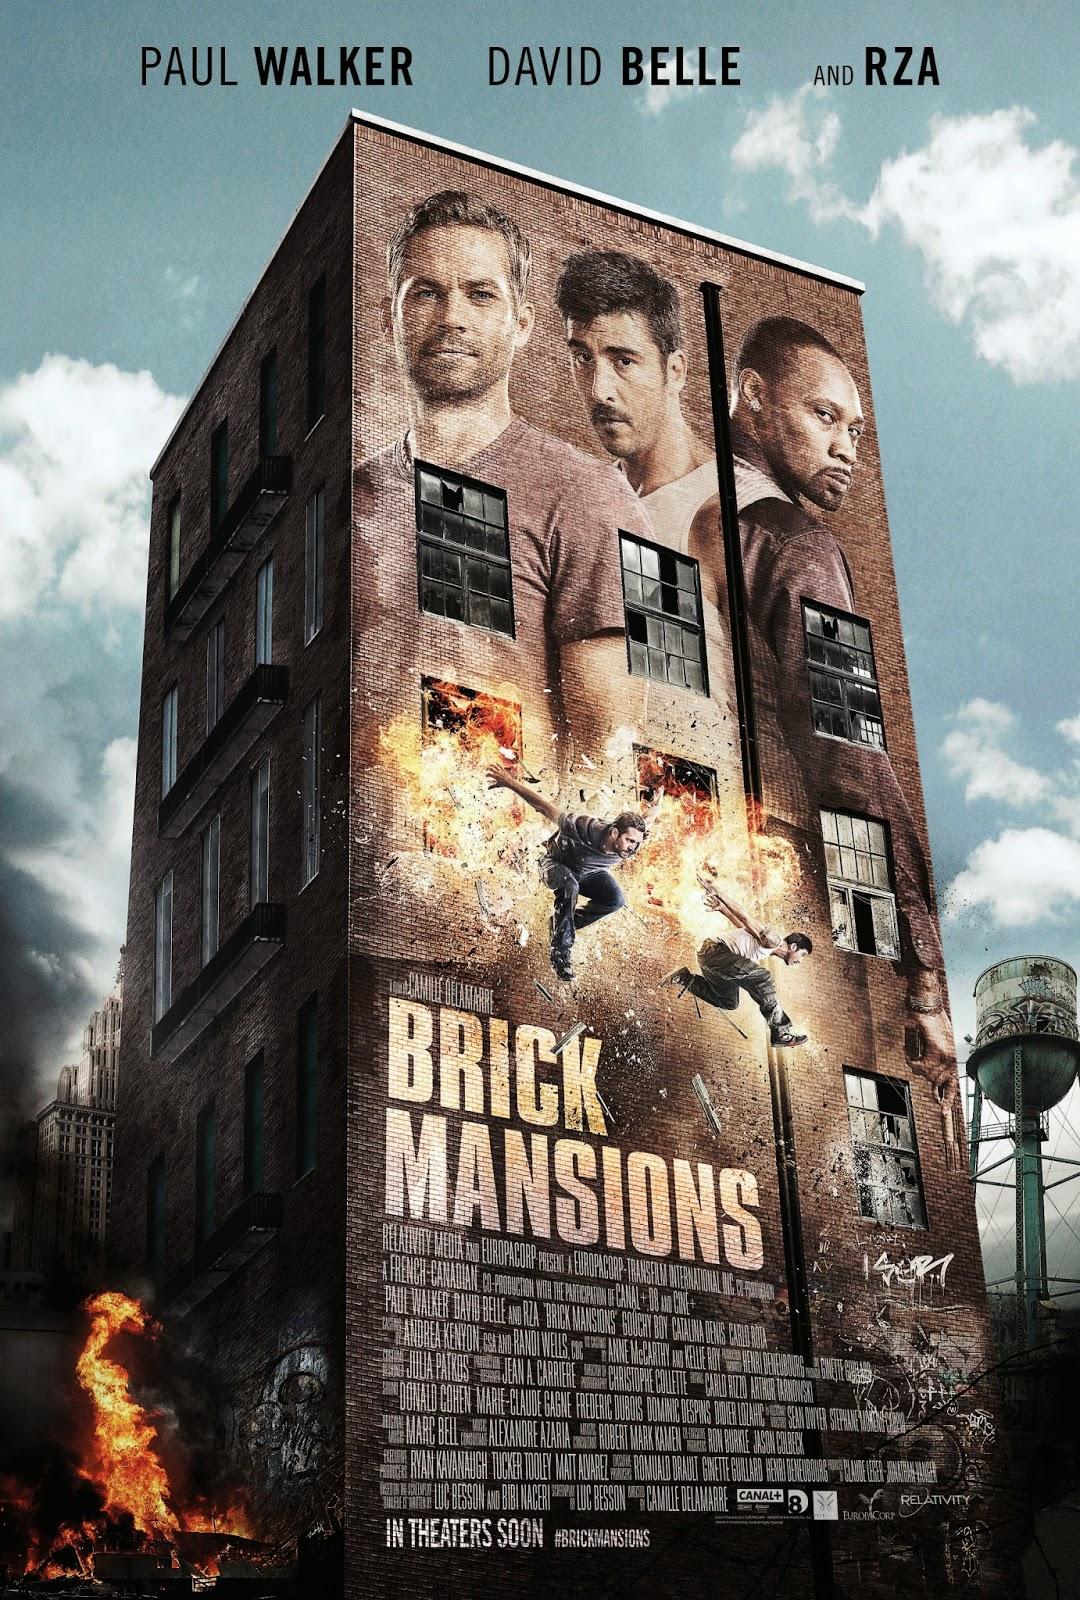 paul walker david belle brick mansions wallpapers - Paul Walker David Belle Brick Mansions Wallpapers HD